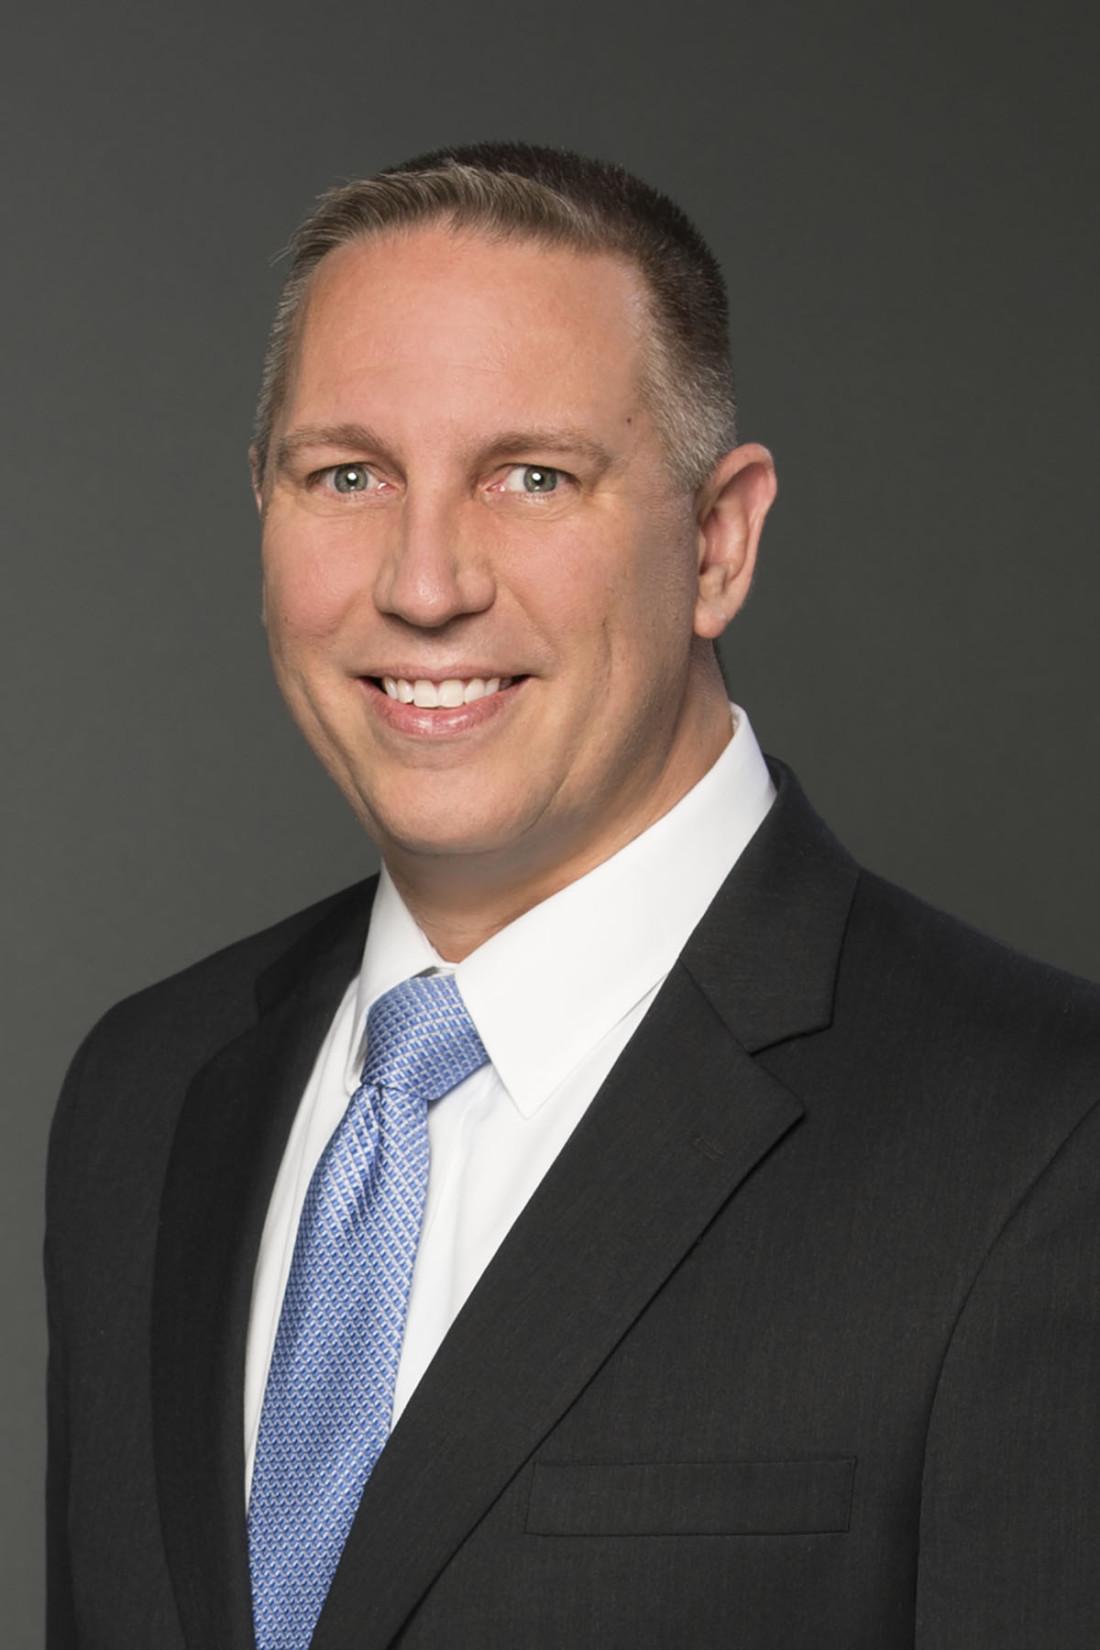 Ken Dorsney